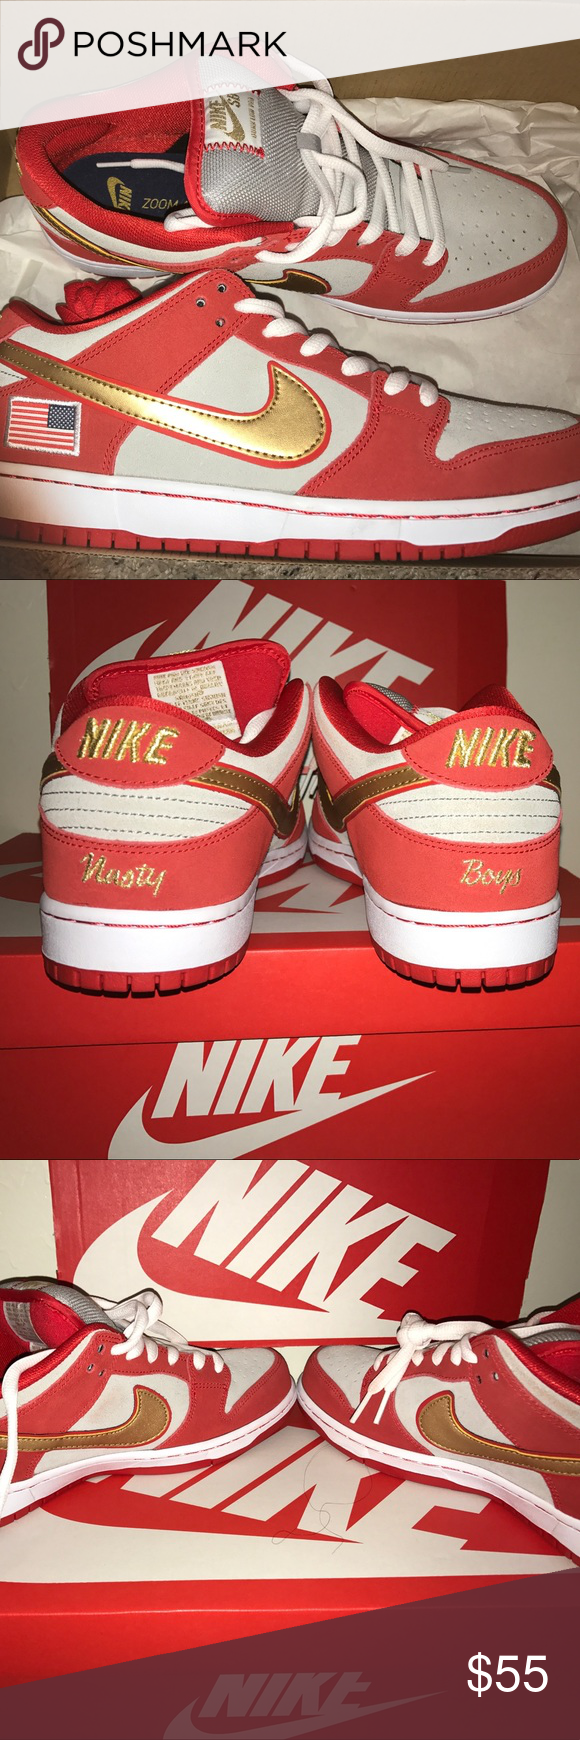 Brand new Nike SB Dunk Low Pro